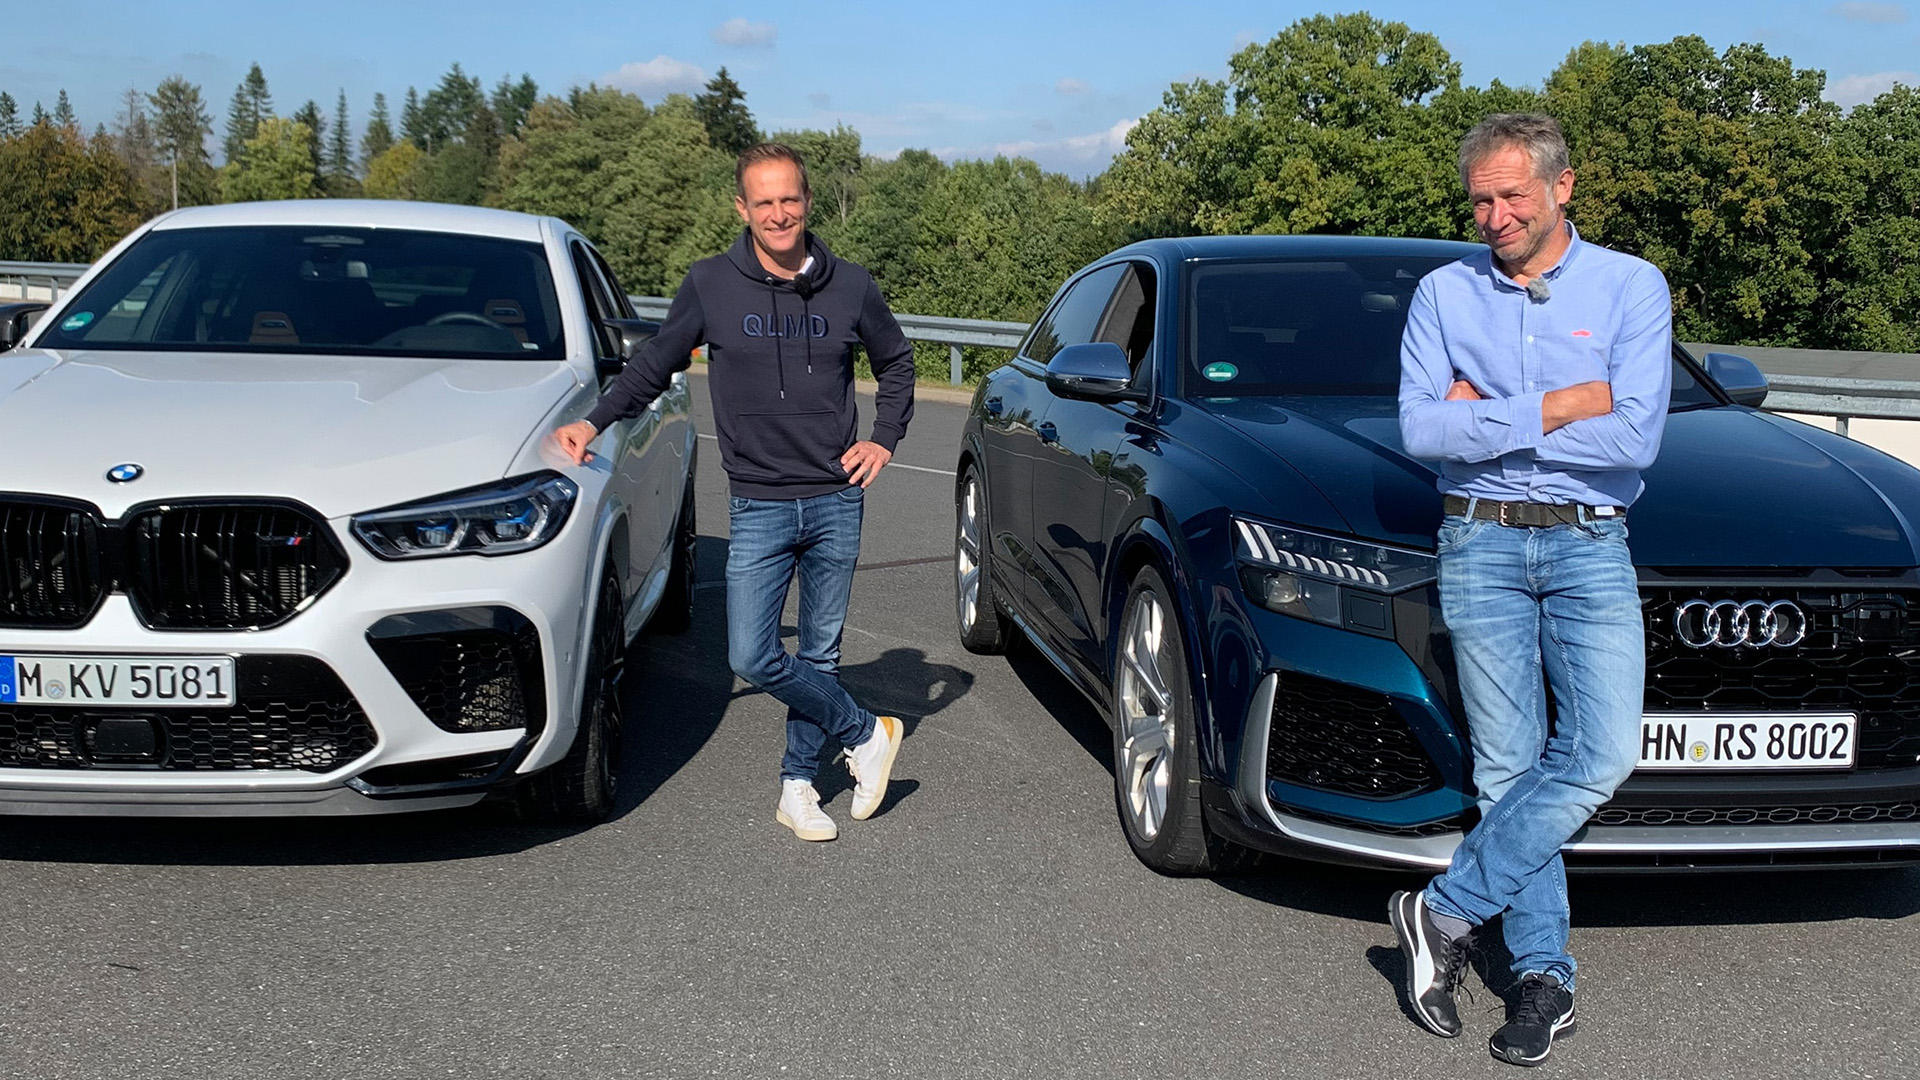 Dicke Dinger: Audi RS Q8 vs. BMW X6 M Competition  | Folge 530